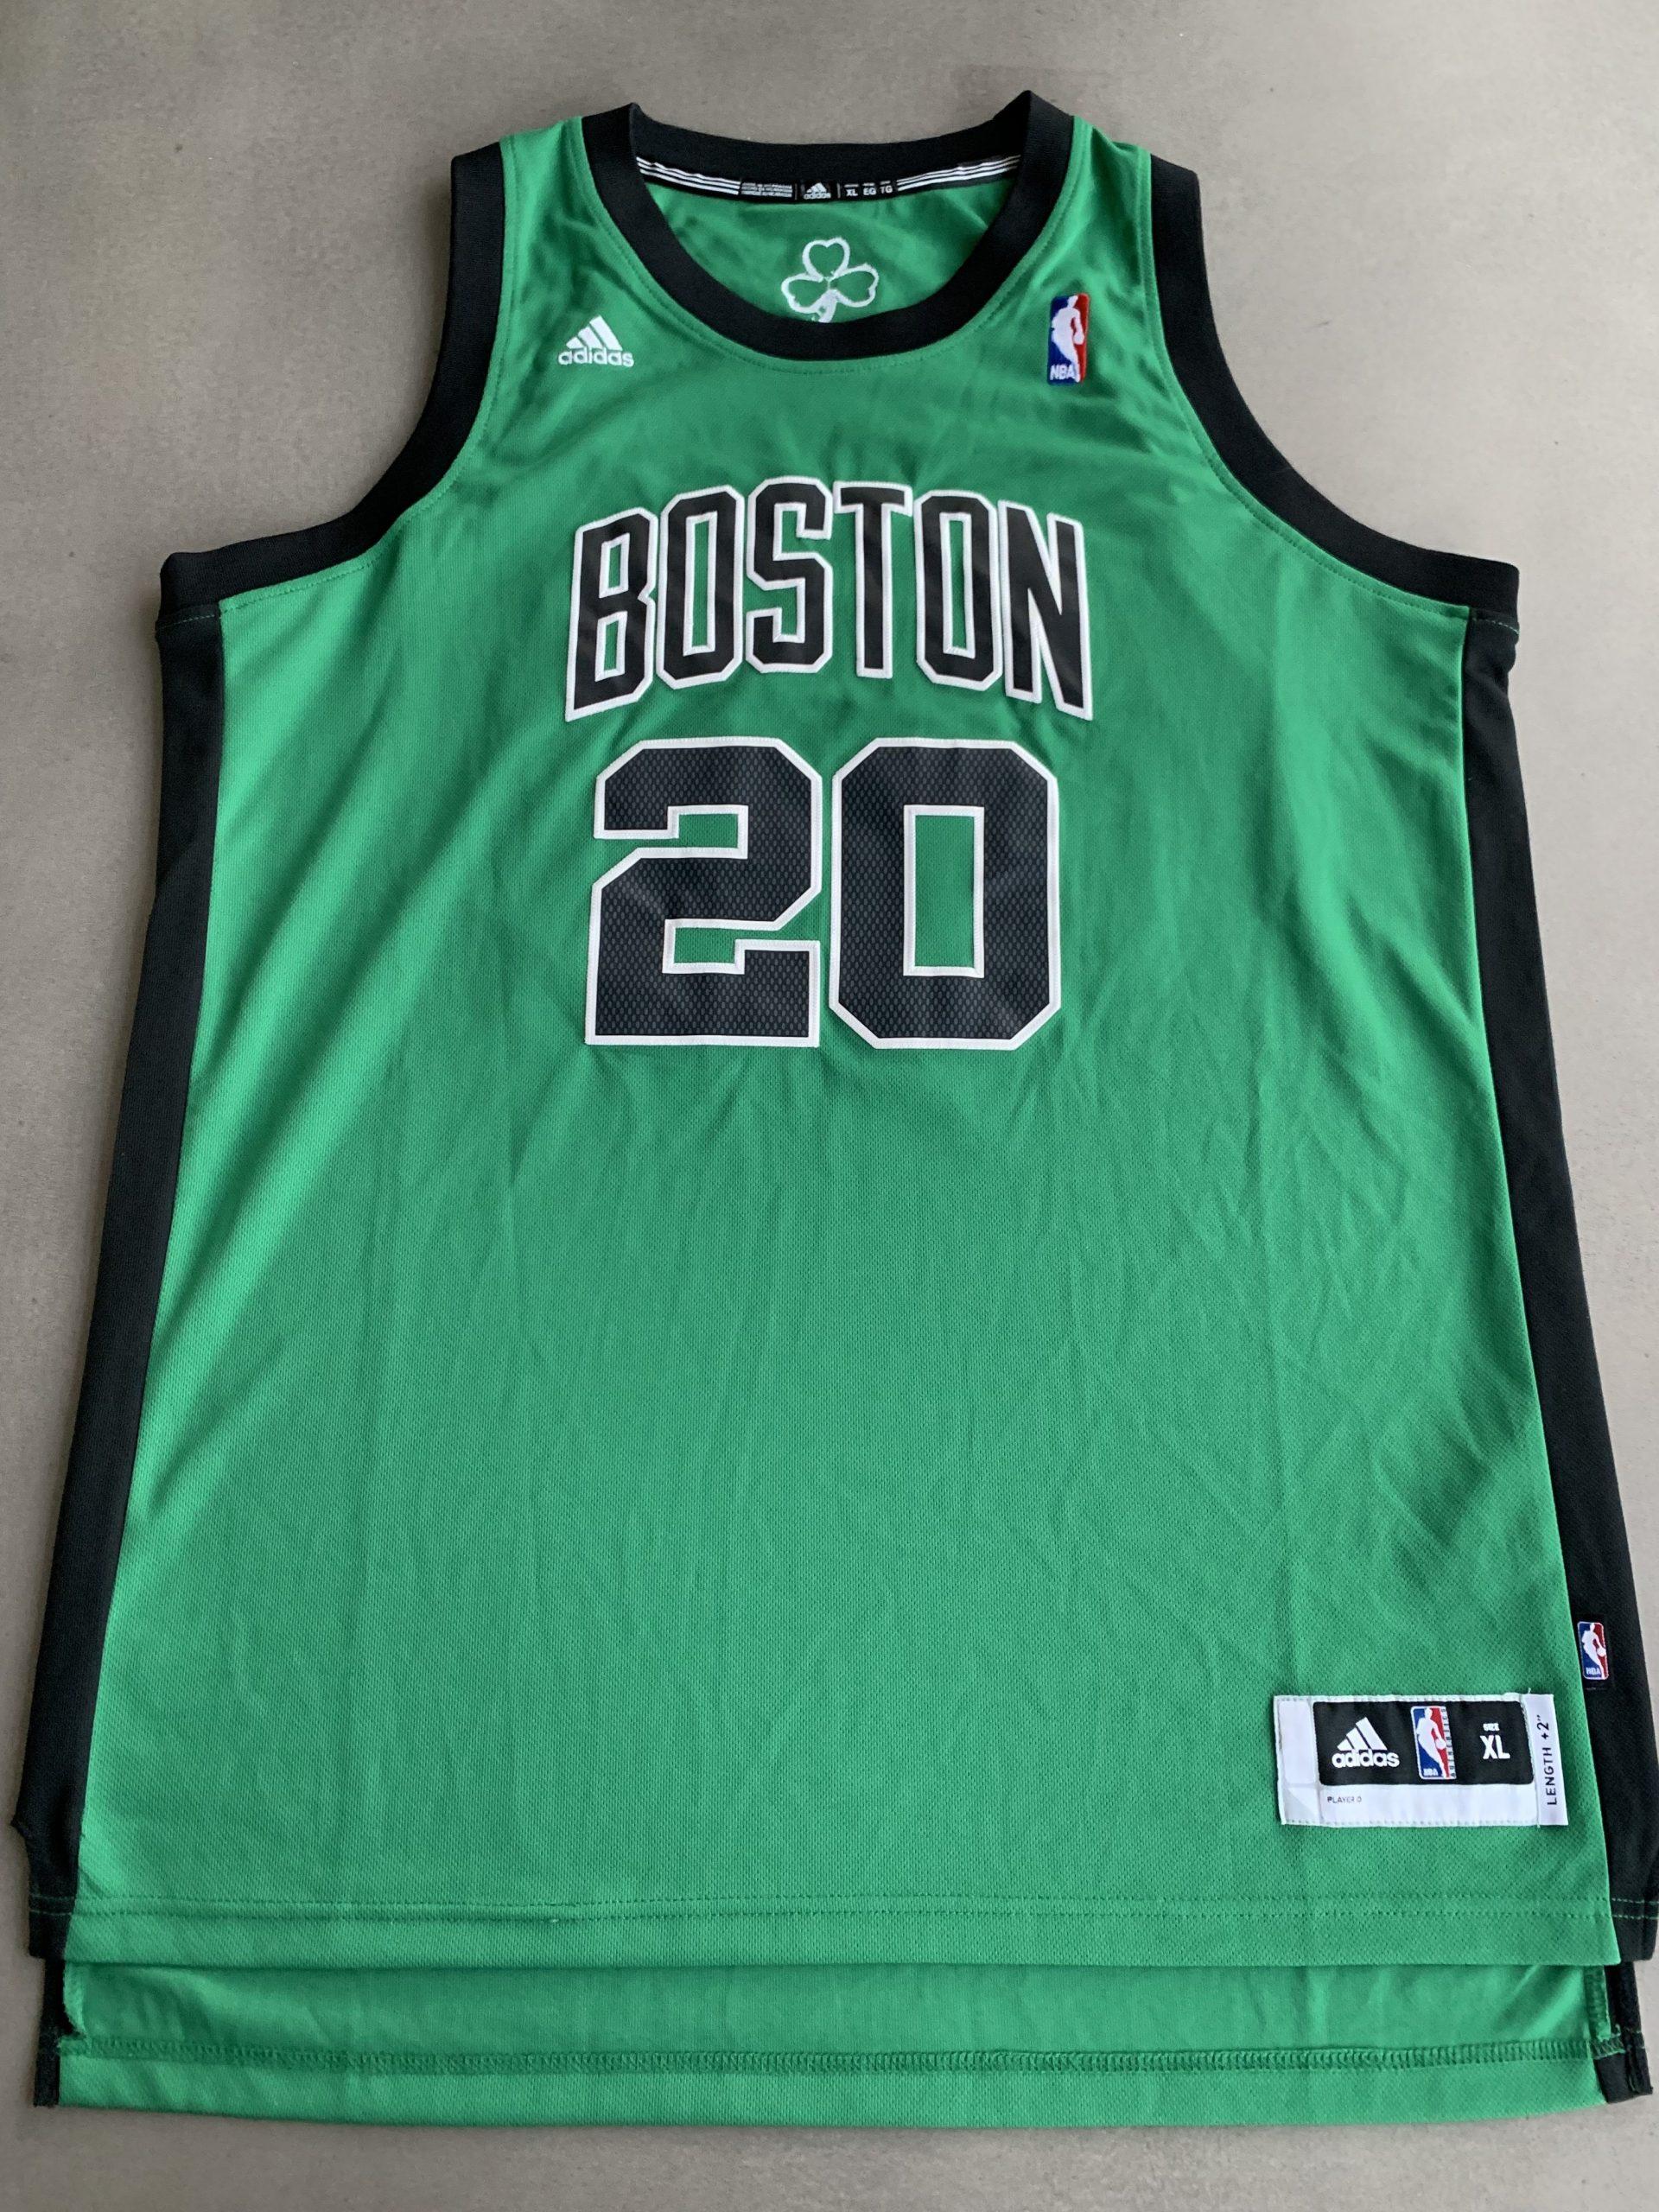 cheap nba jerseys legit adidas Ray Allen Boston Celtics Hardwood Classics Throwback Original Retro NBA Swingman Jersey With Free Shipping